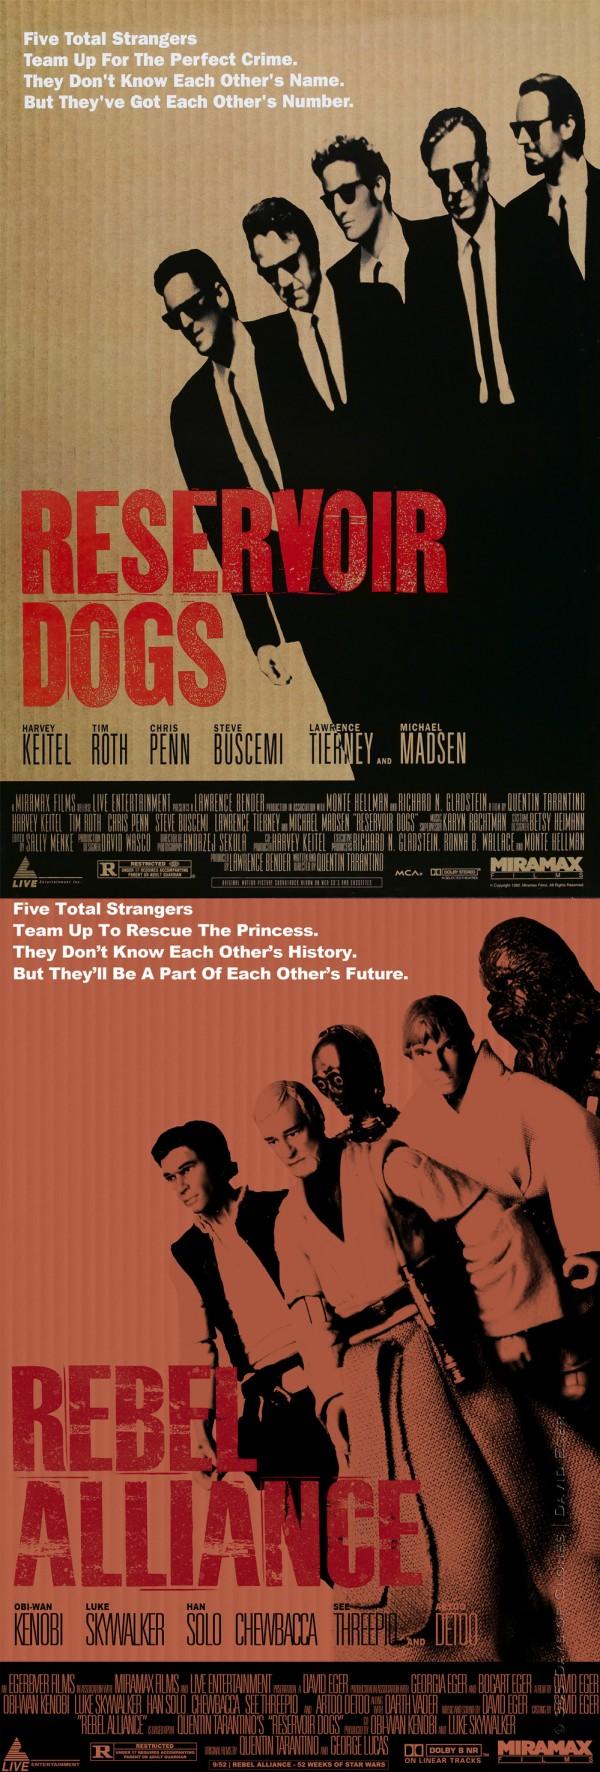 Póster de Reservoir Dogs clonificado